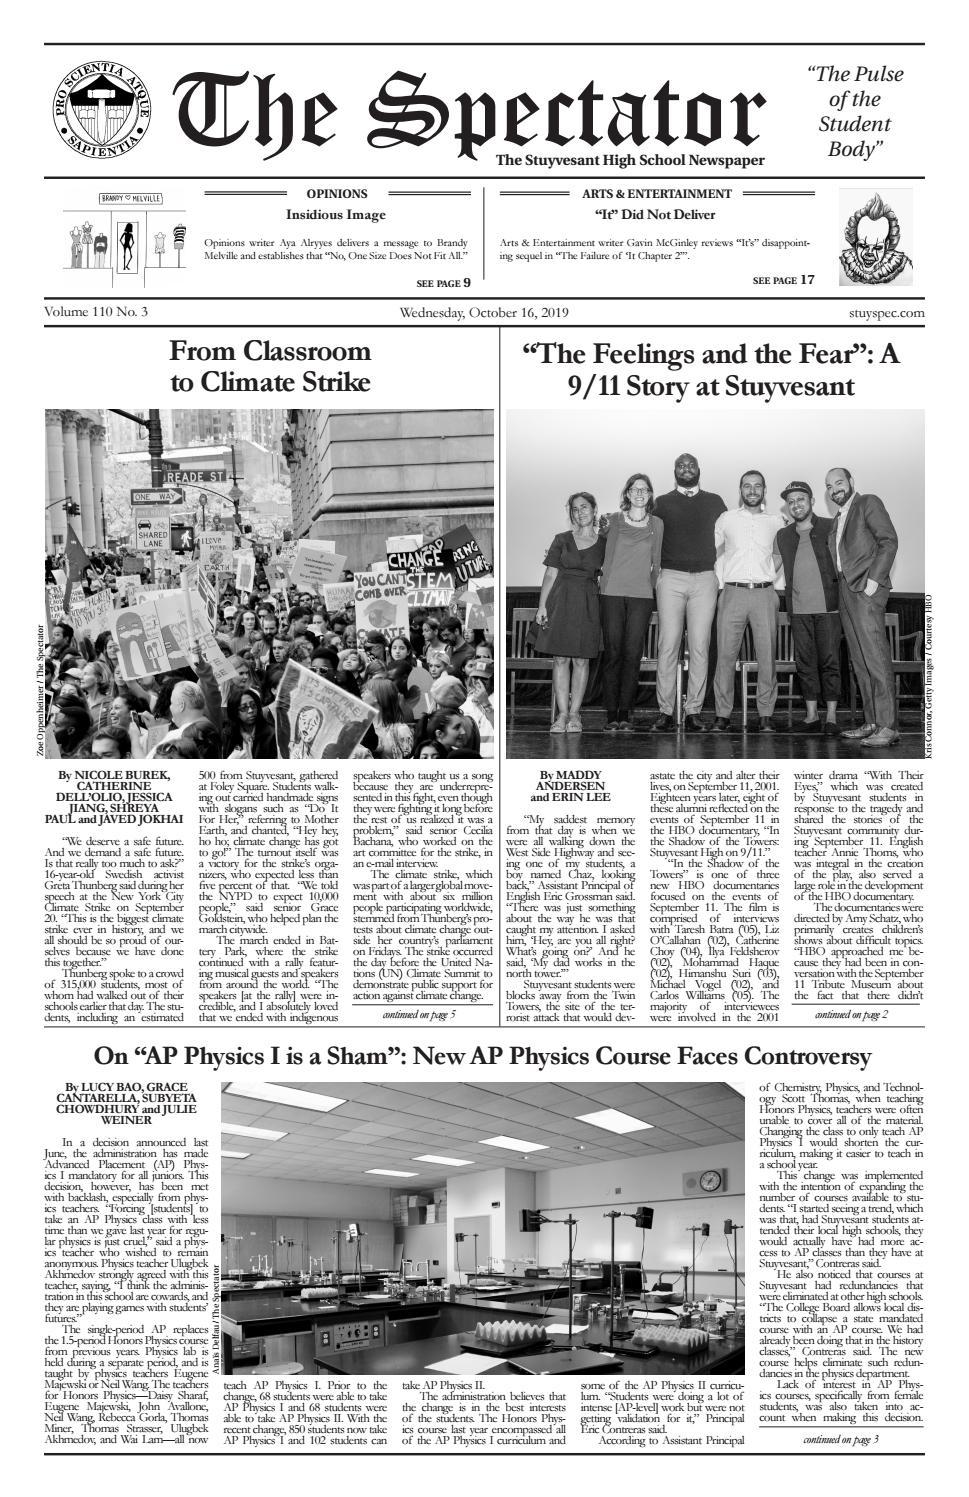 Volume 110, Issue 3 by The Stuyvesant Spectator issuu